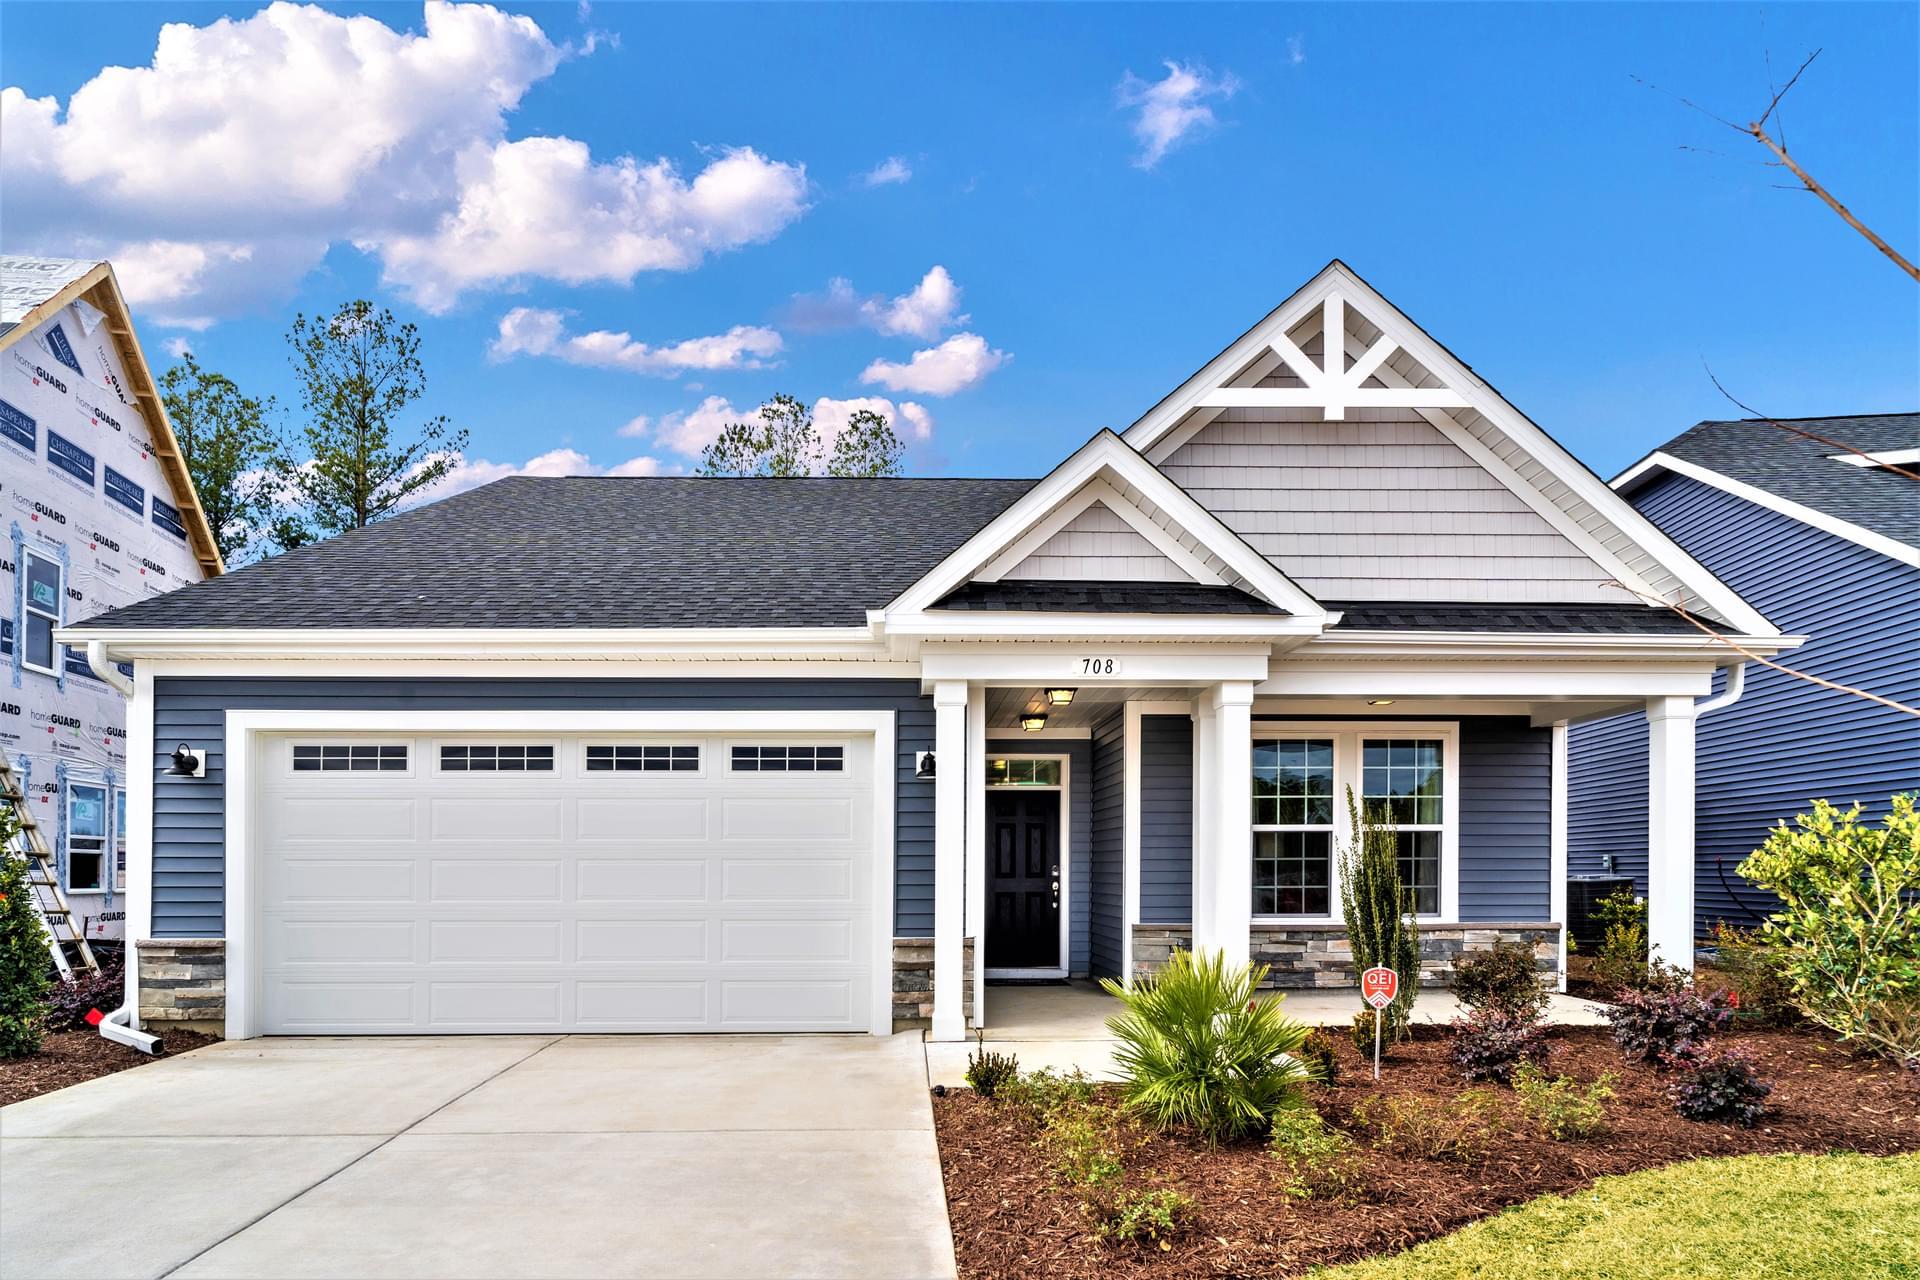 Chesapeake Homes Elevation C